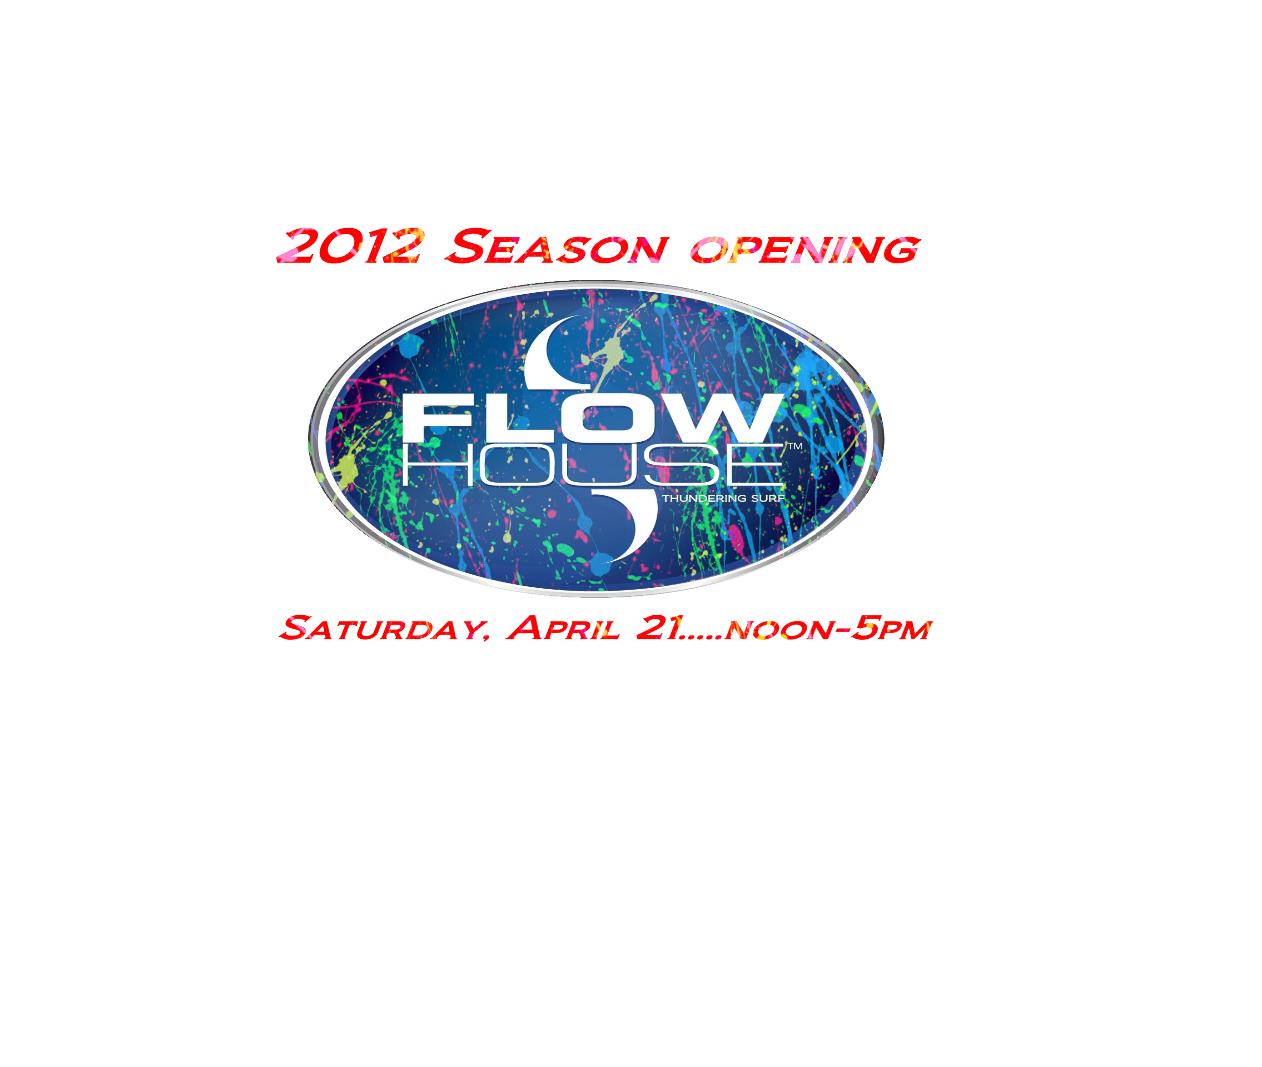 2012 Season Opener